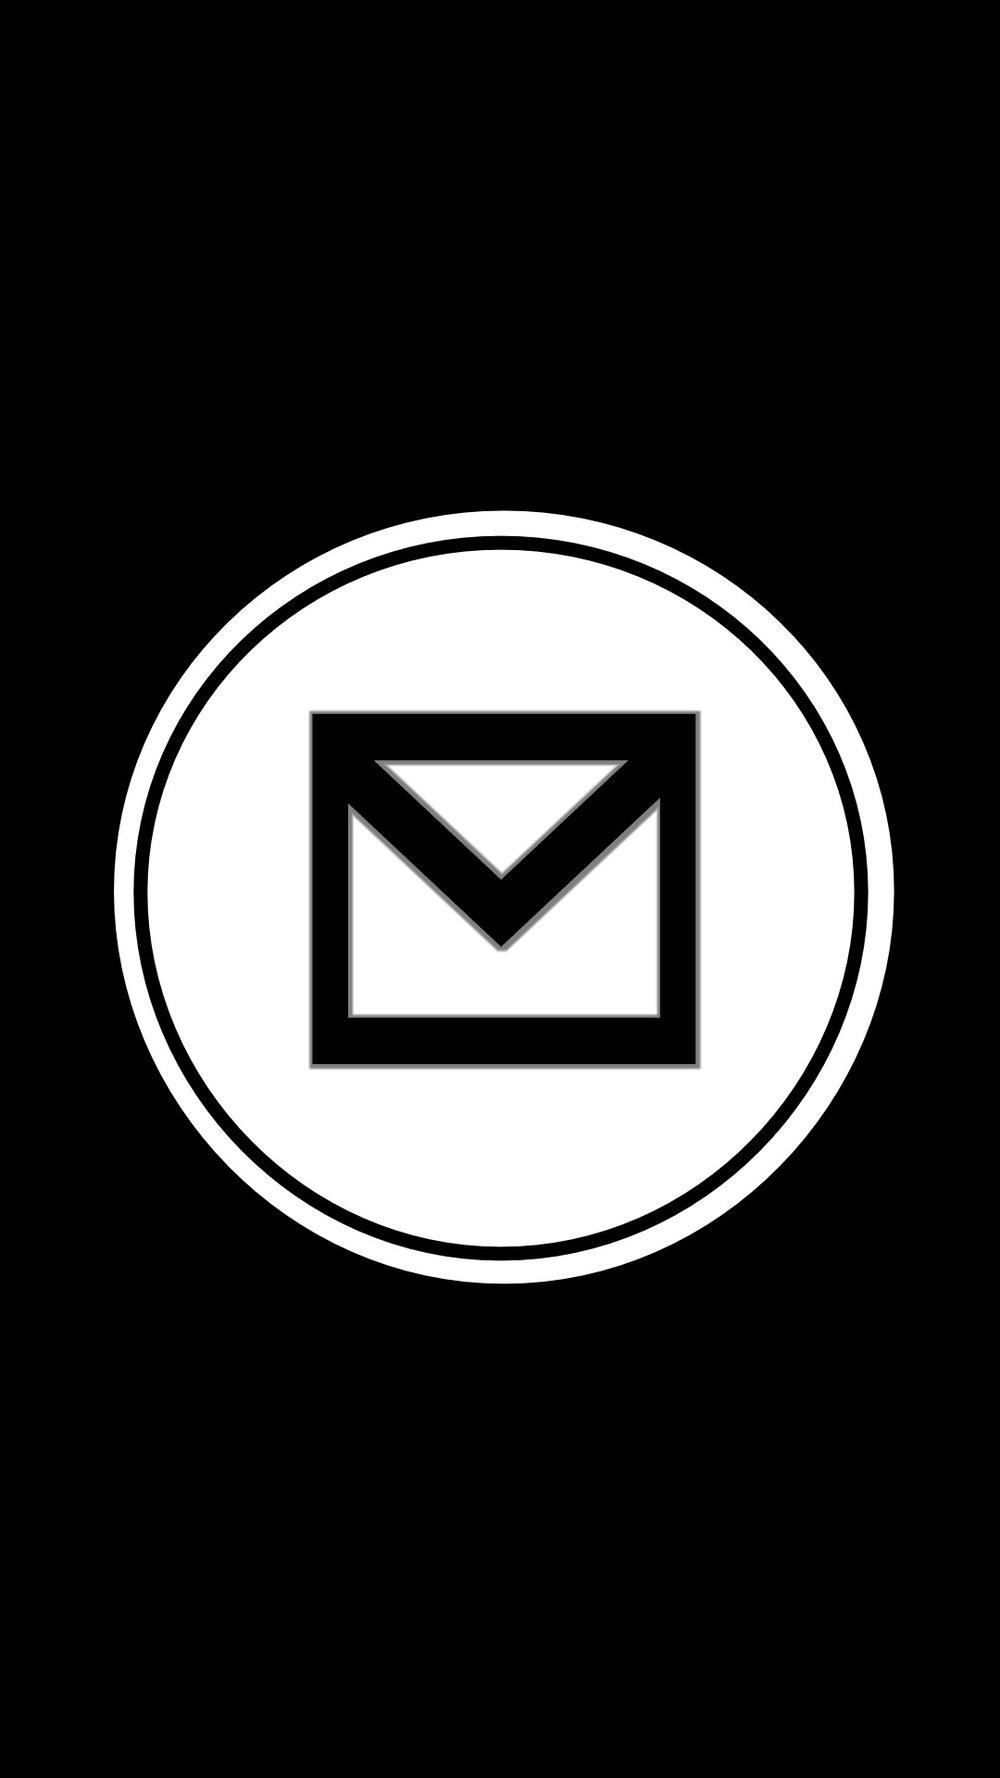 Instagram-cover-contact-black.jpg